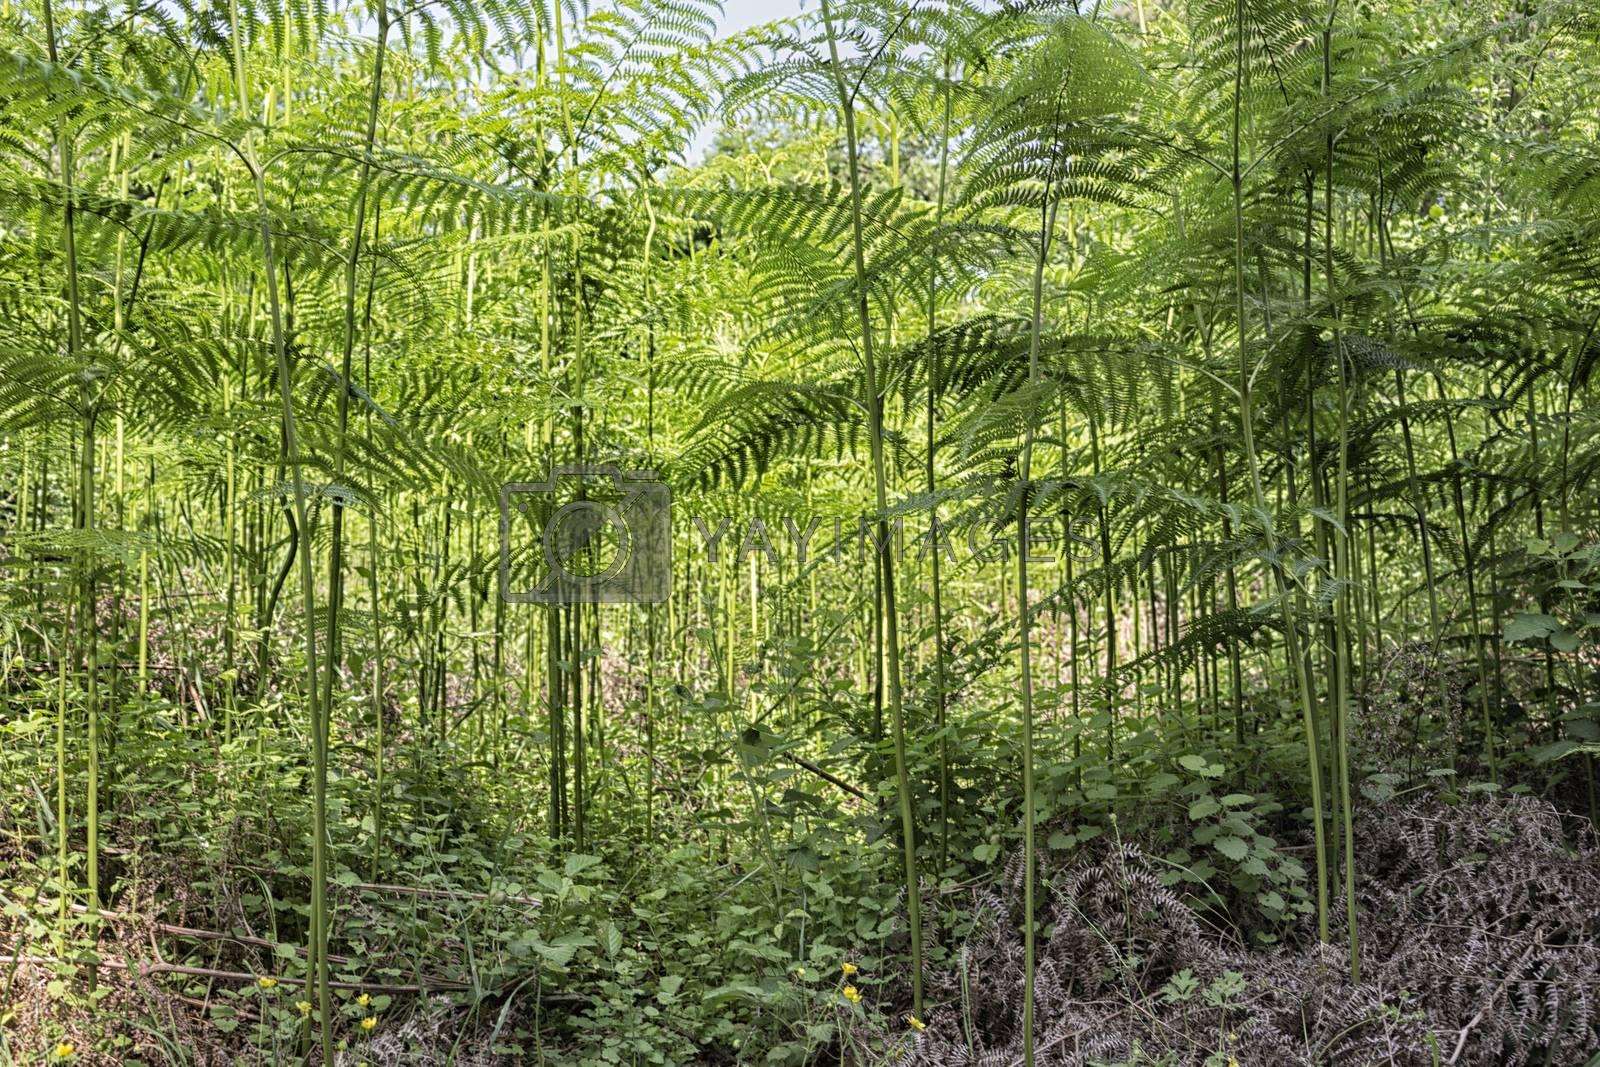 Ferns  in the Pialassa della Baiona brackish lagoon near Marina Romea along the  Adriatic seaside in Ravenna (Italy)